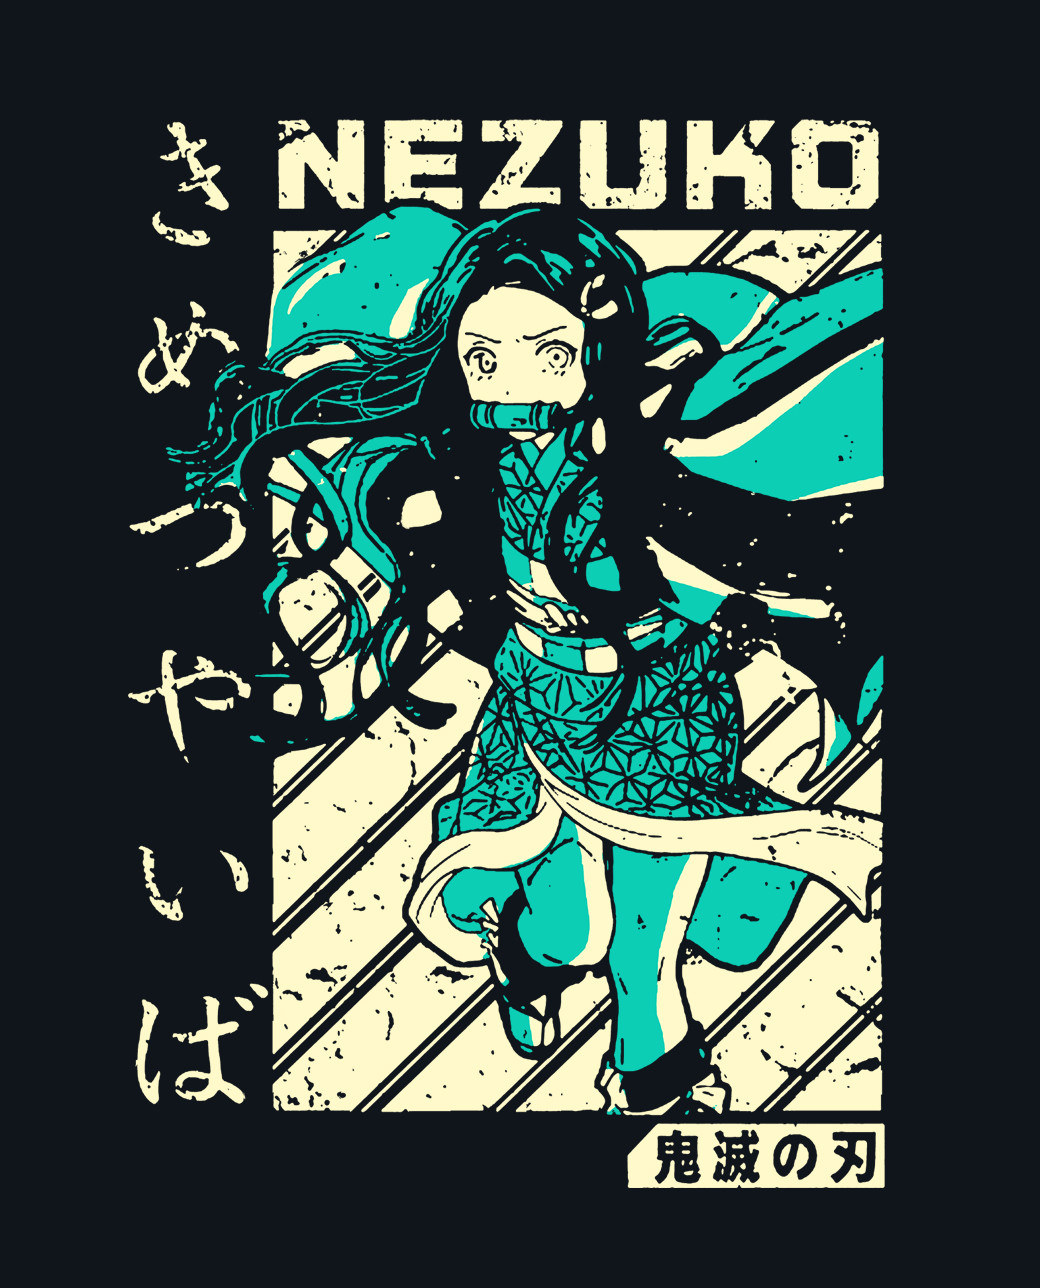 nezuko, guardianes de la noche